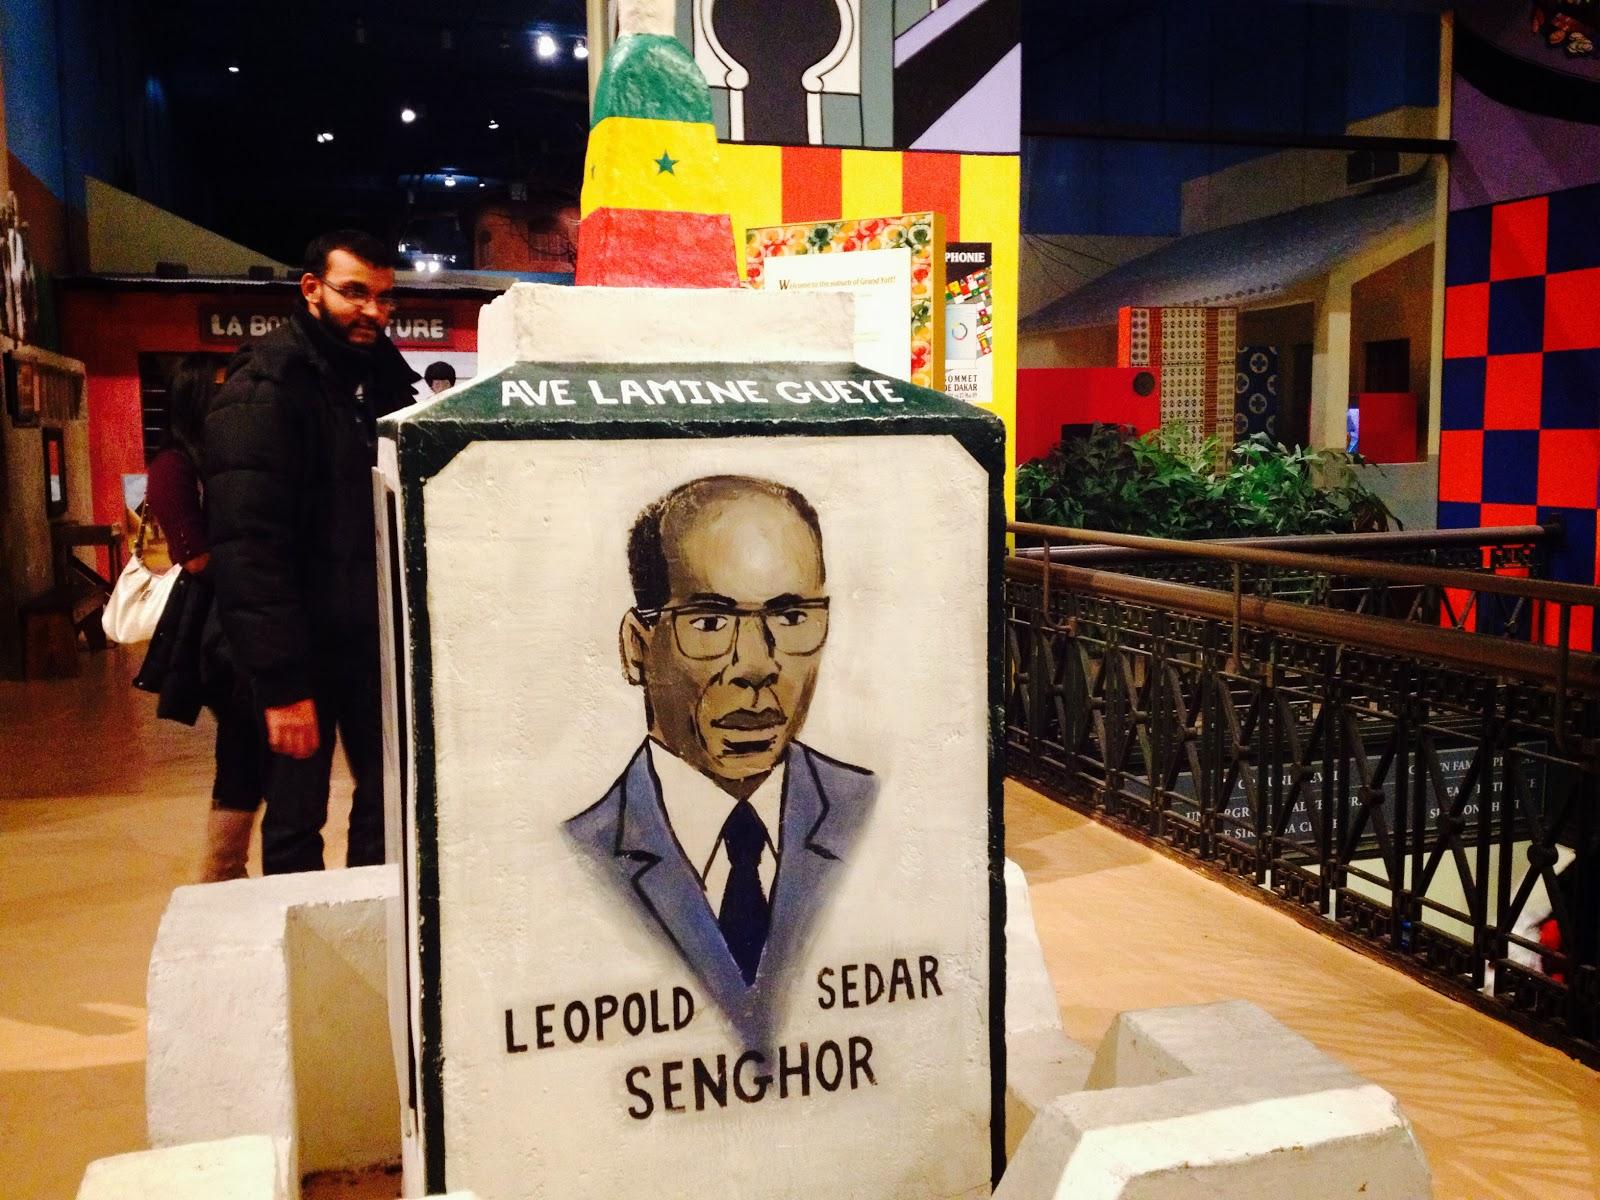 Leopold Sedar Senghor, First President of Senegal